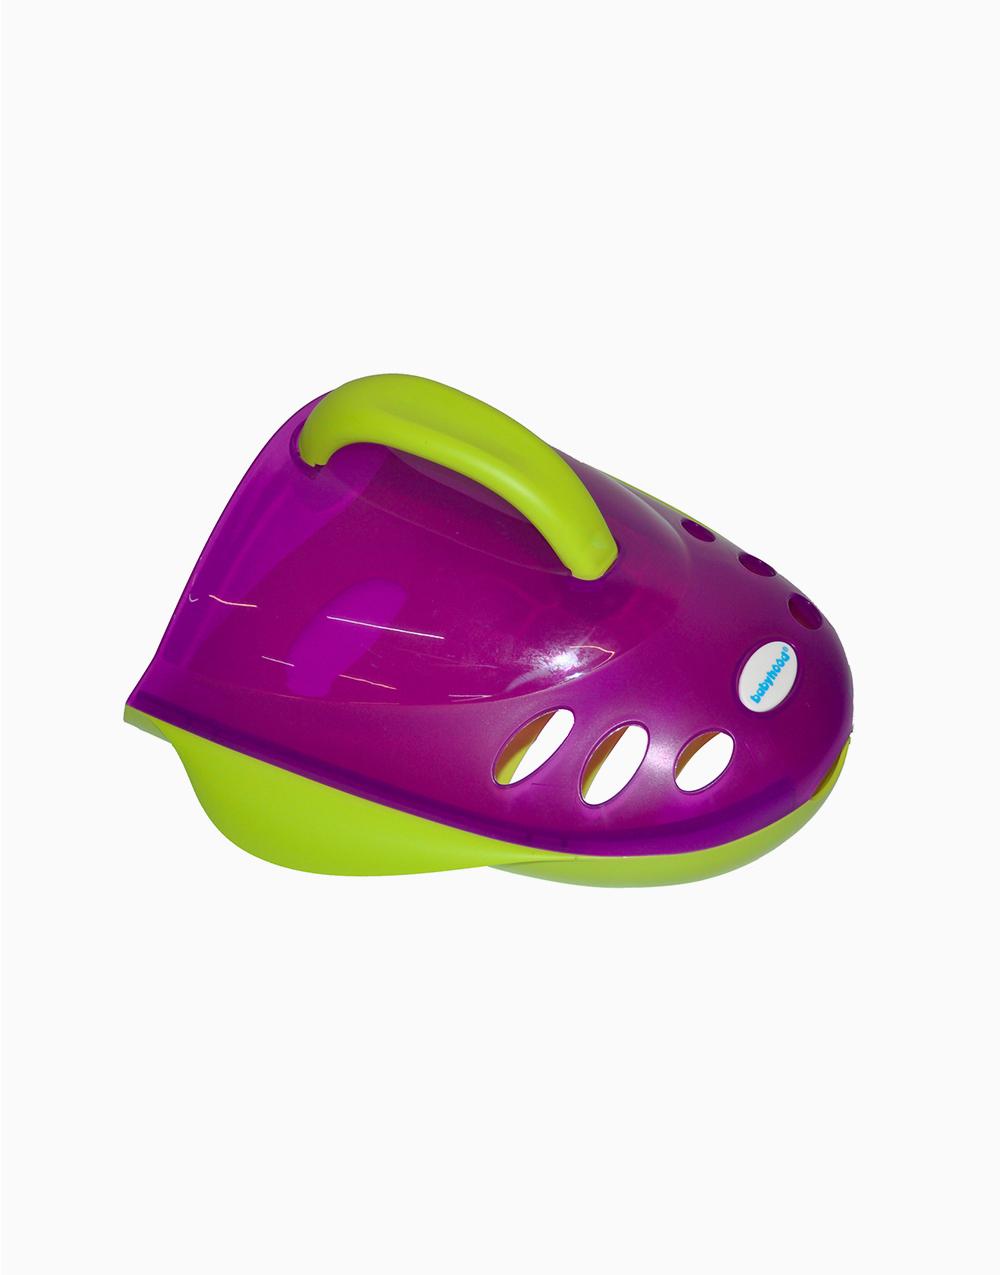 Bath Toy Holder by Babyhood | Green & Violet